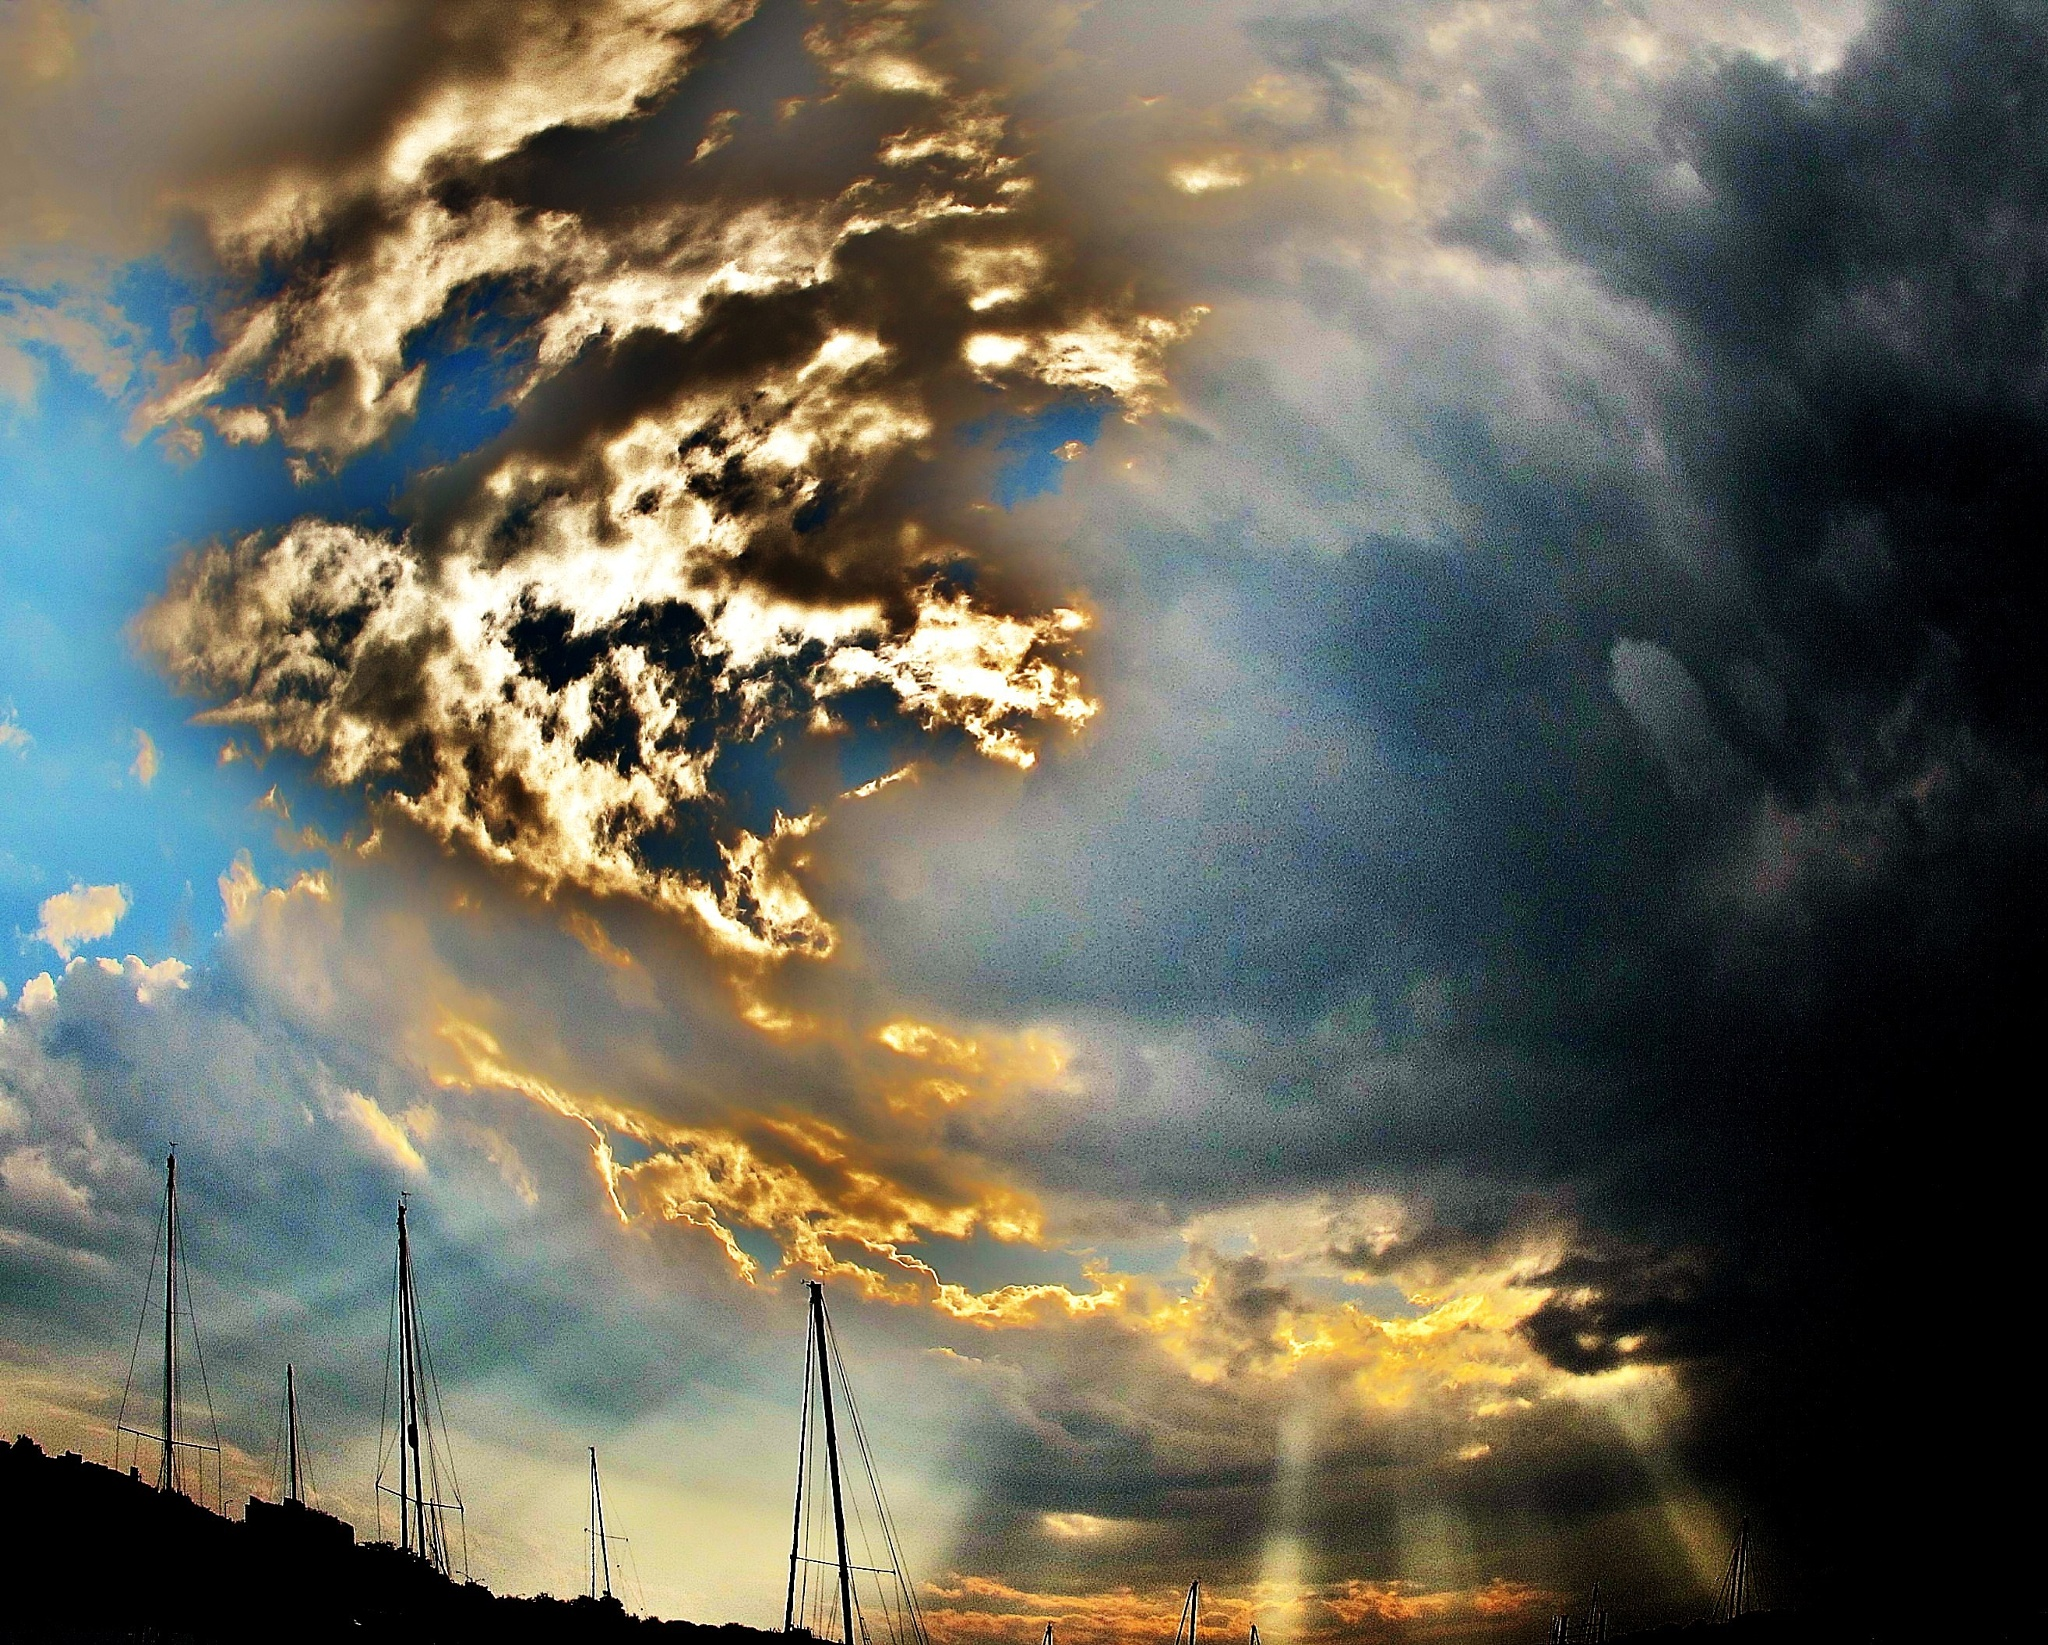 Ray of Sunlight, by Liborio Drogo